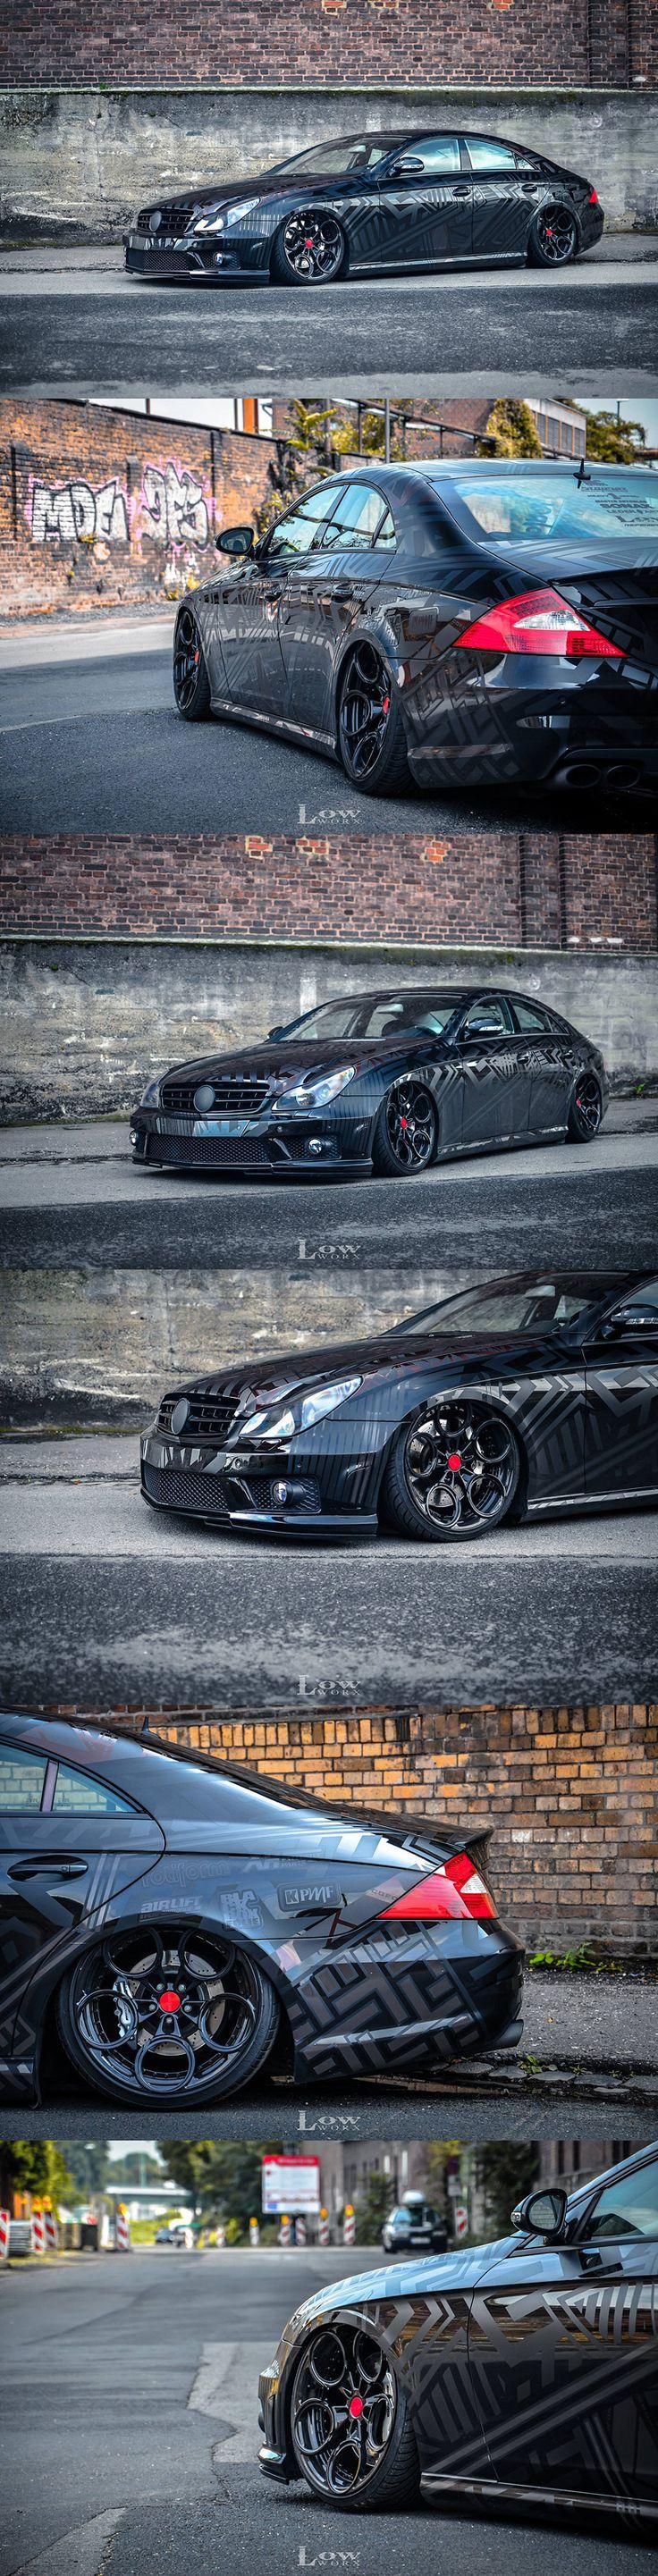 Mercedes Benz CLS 55 AMG Dazzle camo